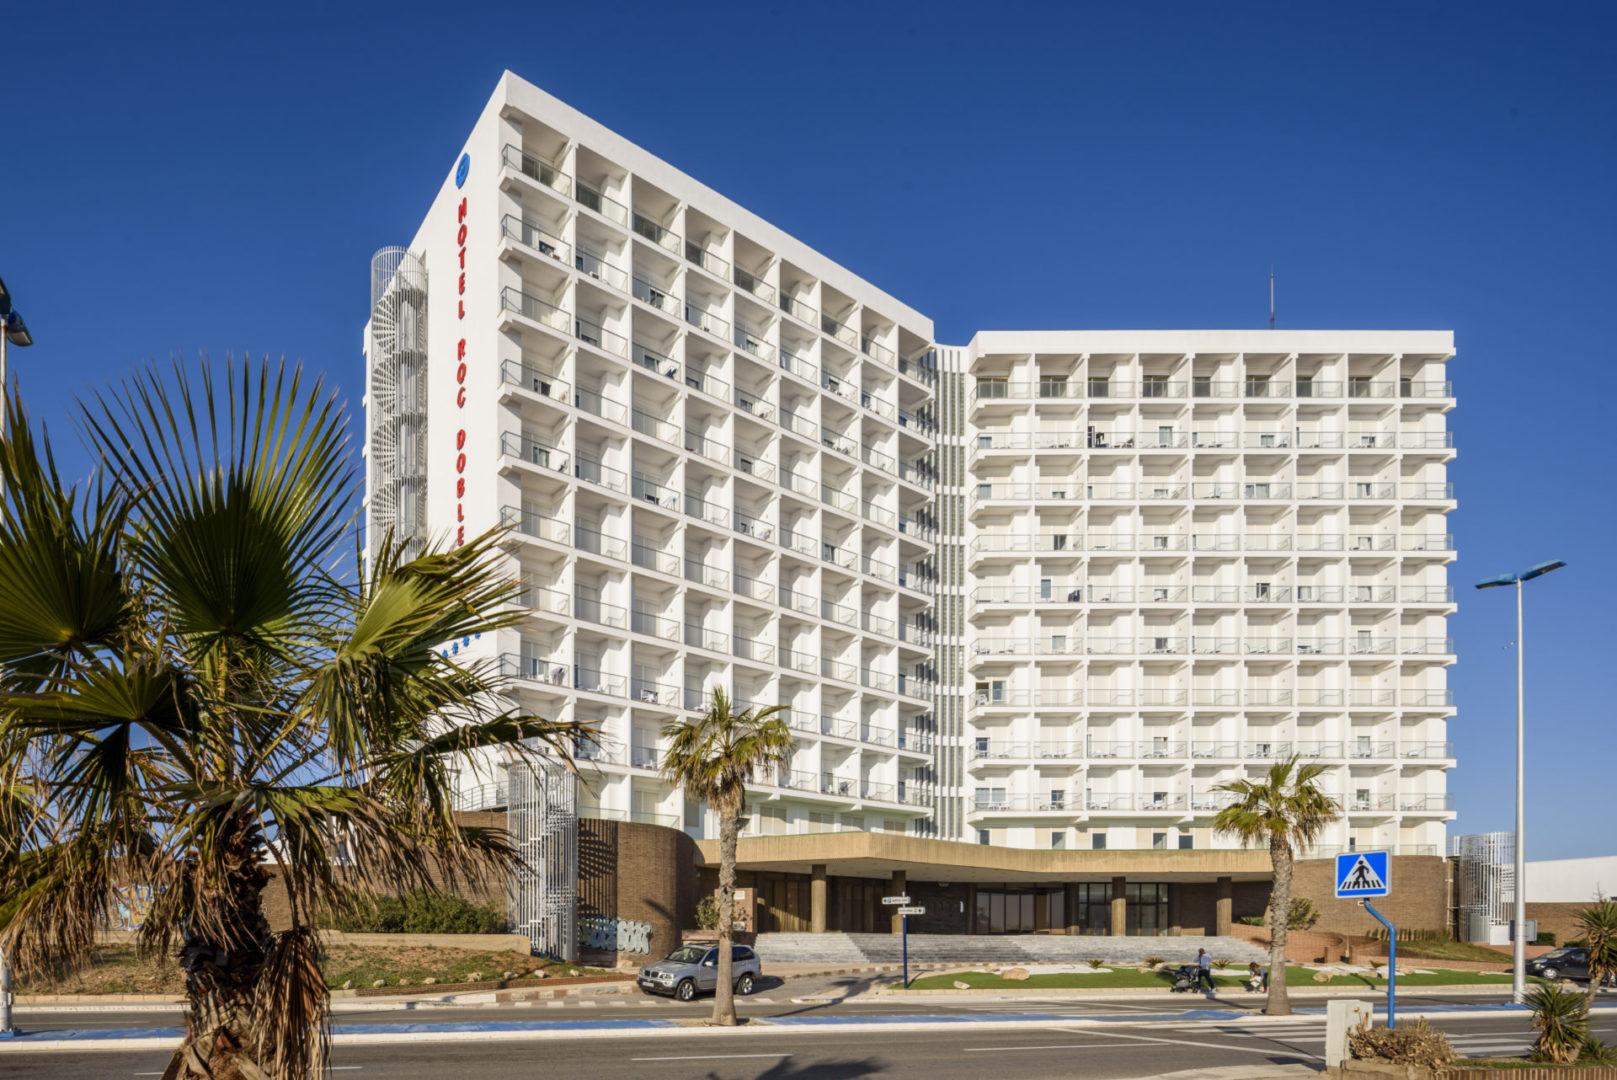 Hotel Doblemar 2-024-La Manga Urdecon